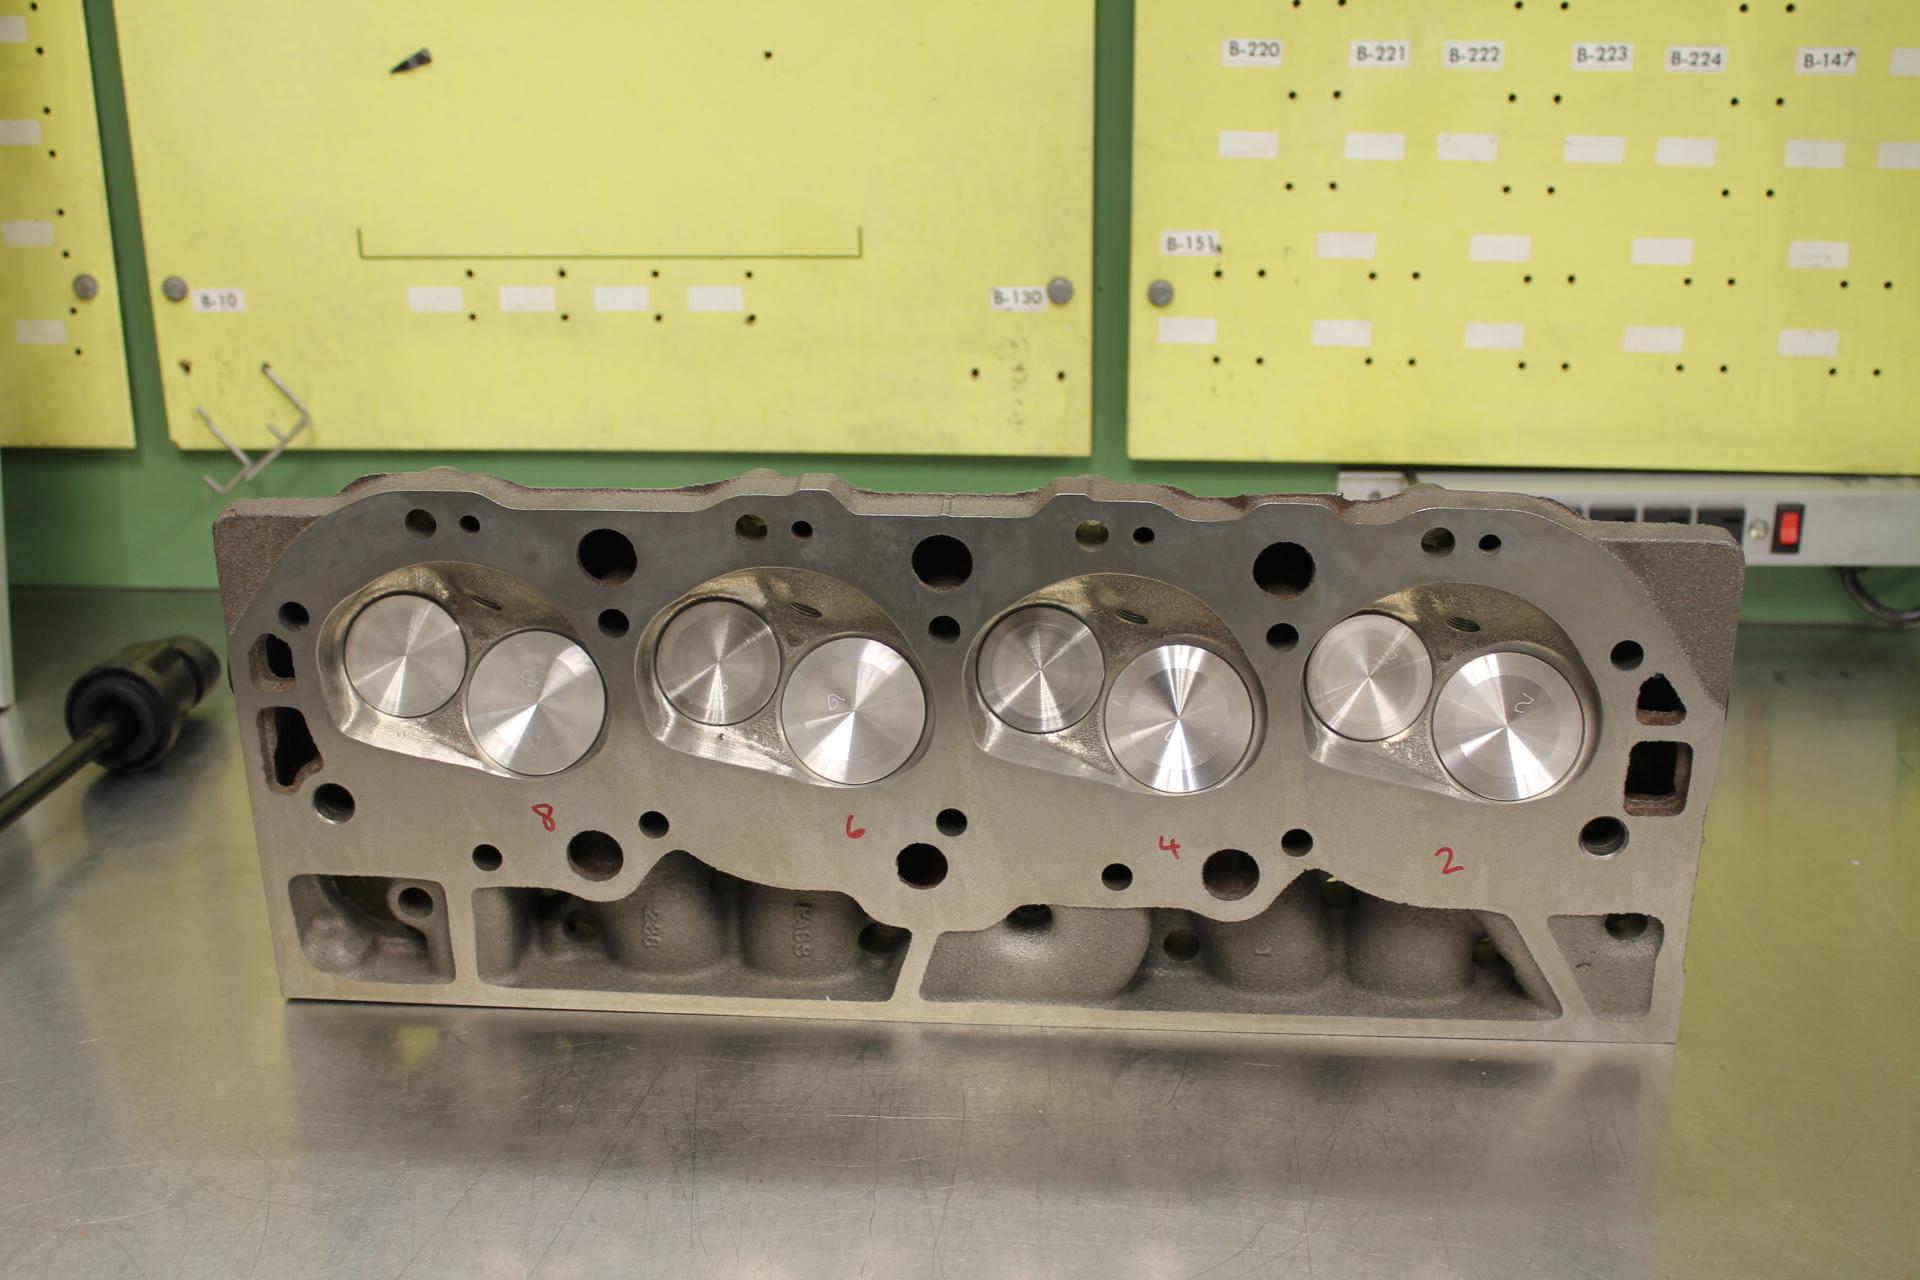 My Peanut Port BBC 467 Engine Build - The Supercar Registry